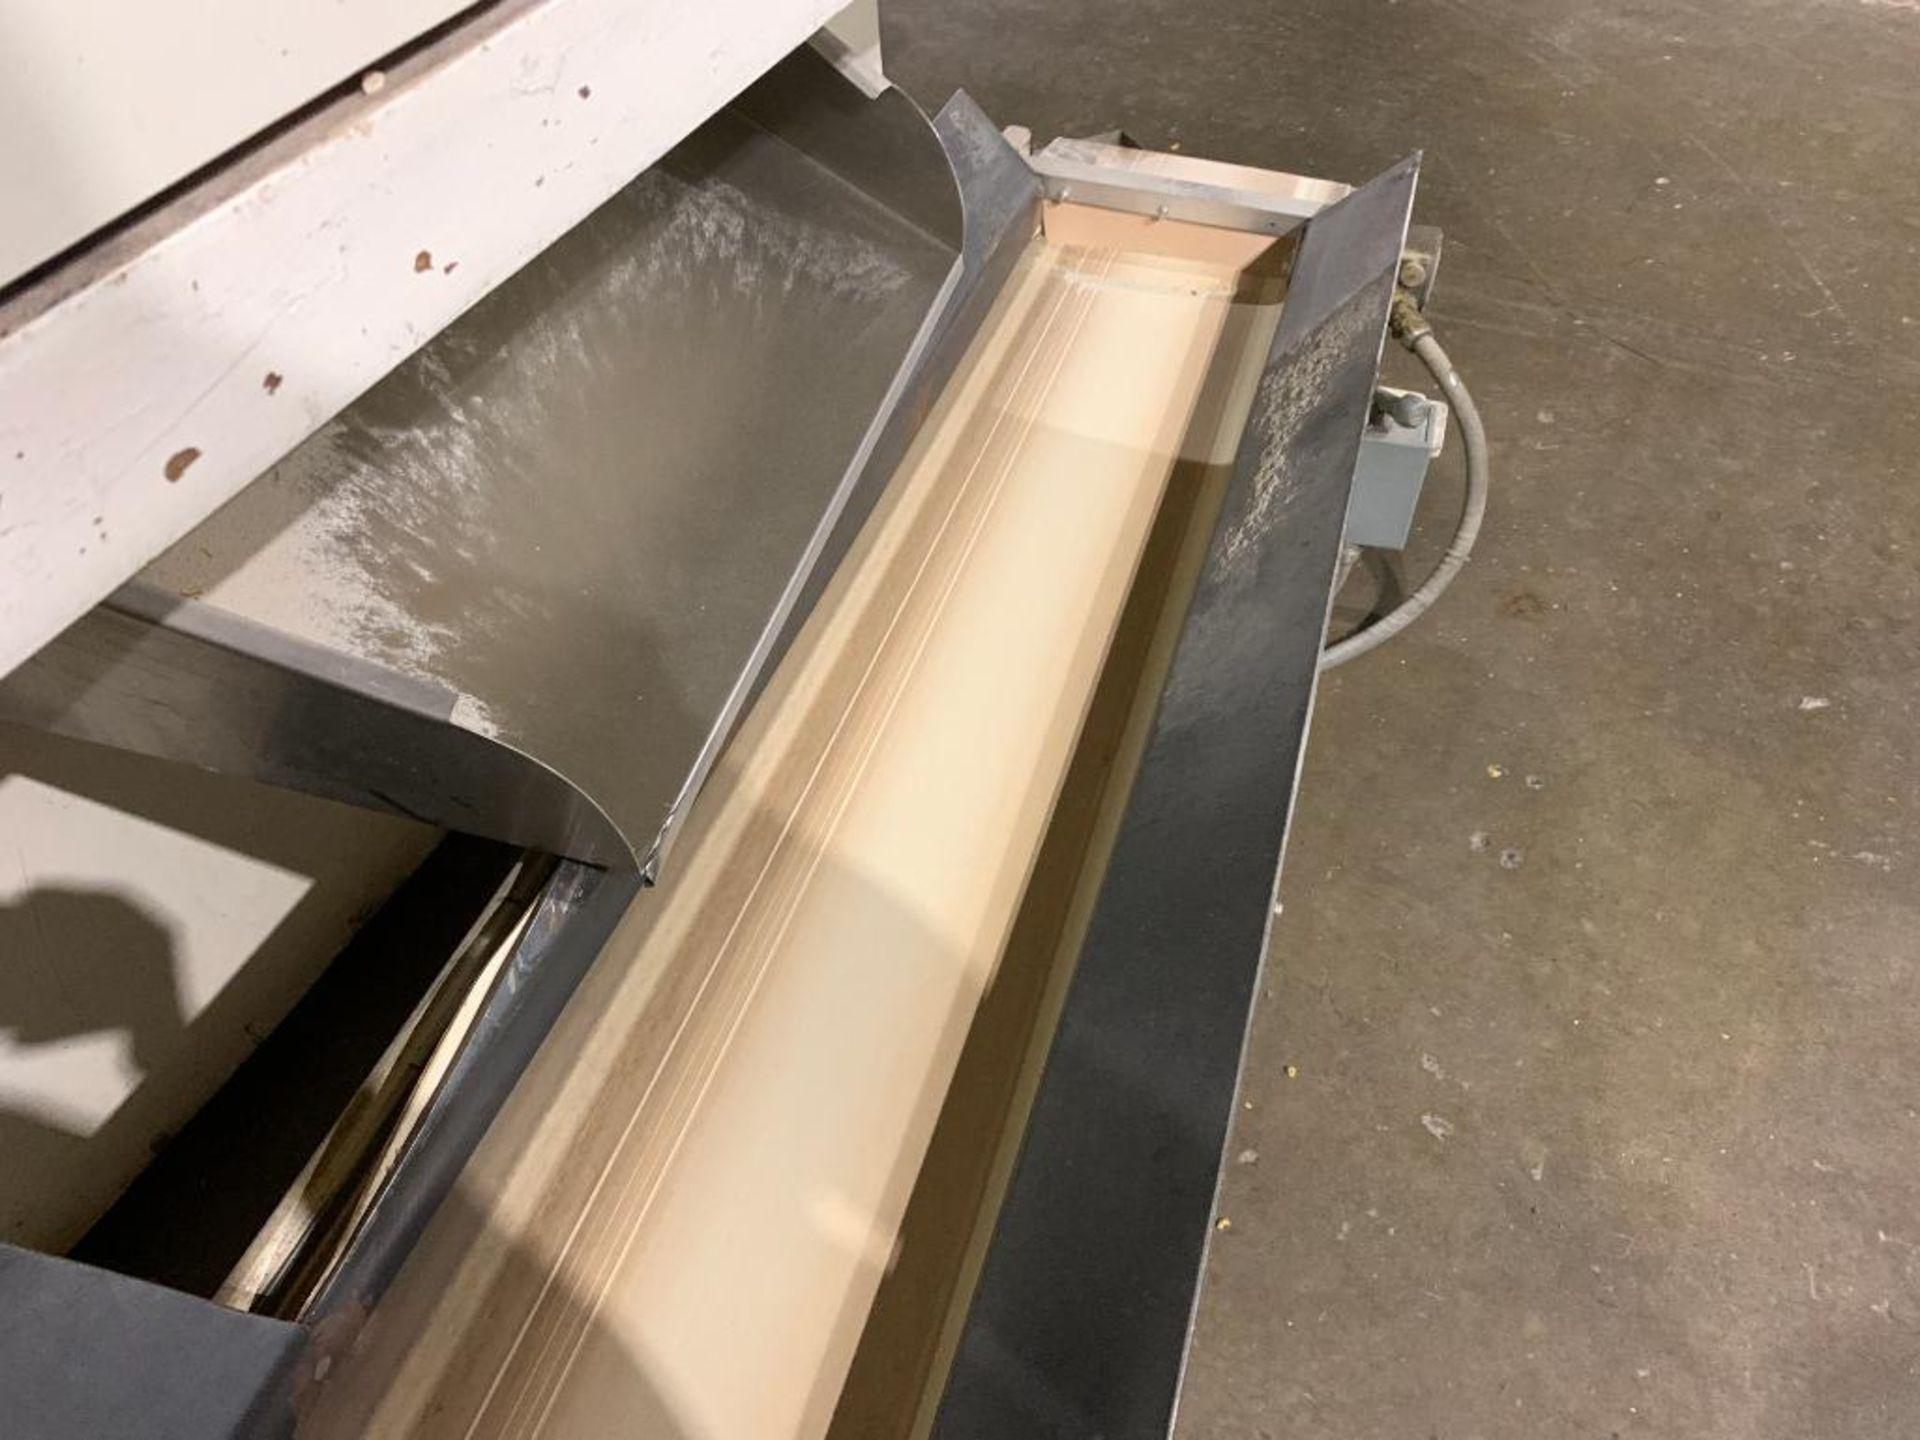 mild steel conveyor - Image 9 of 9